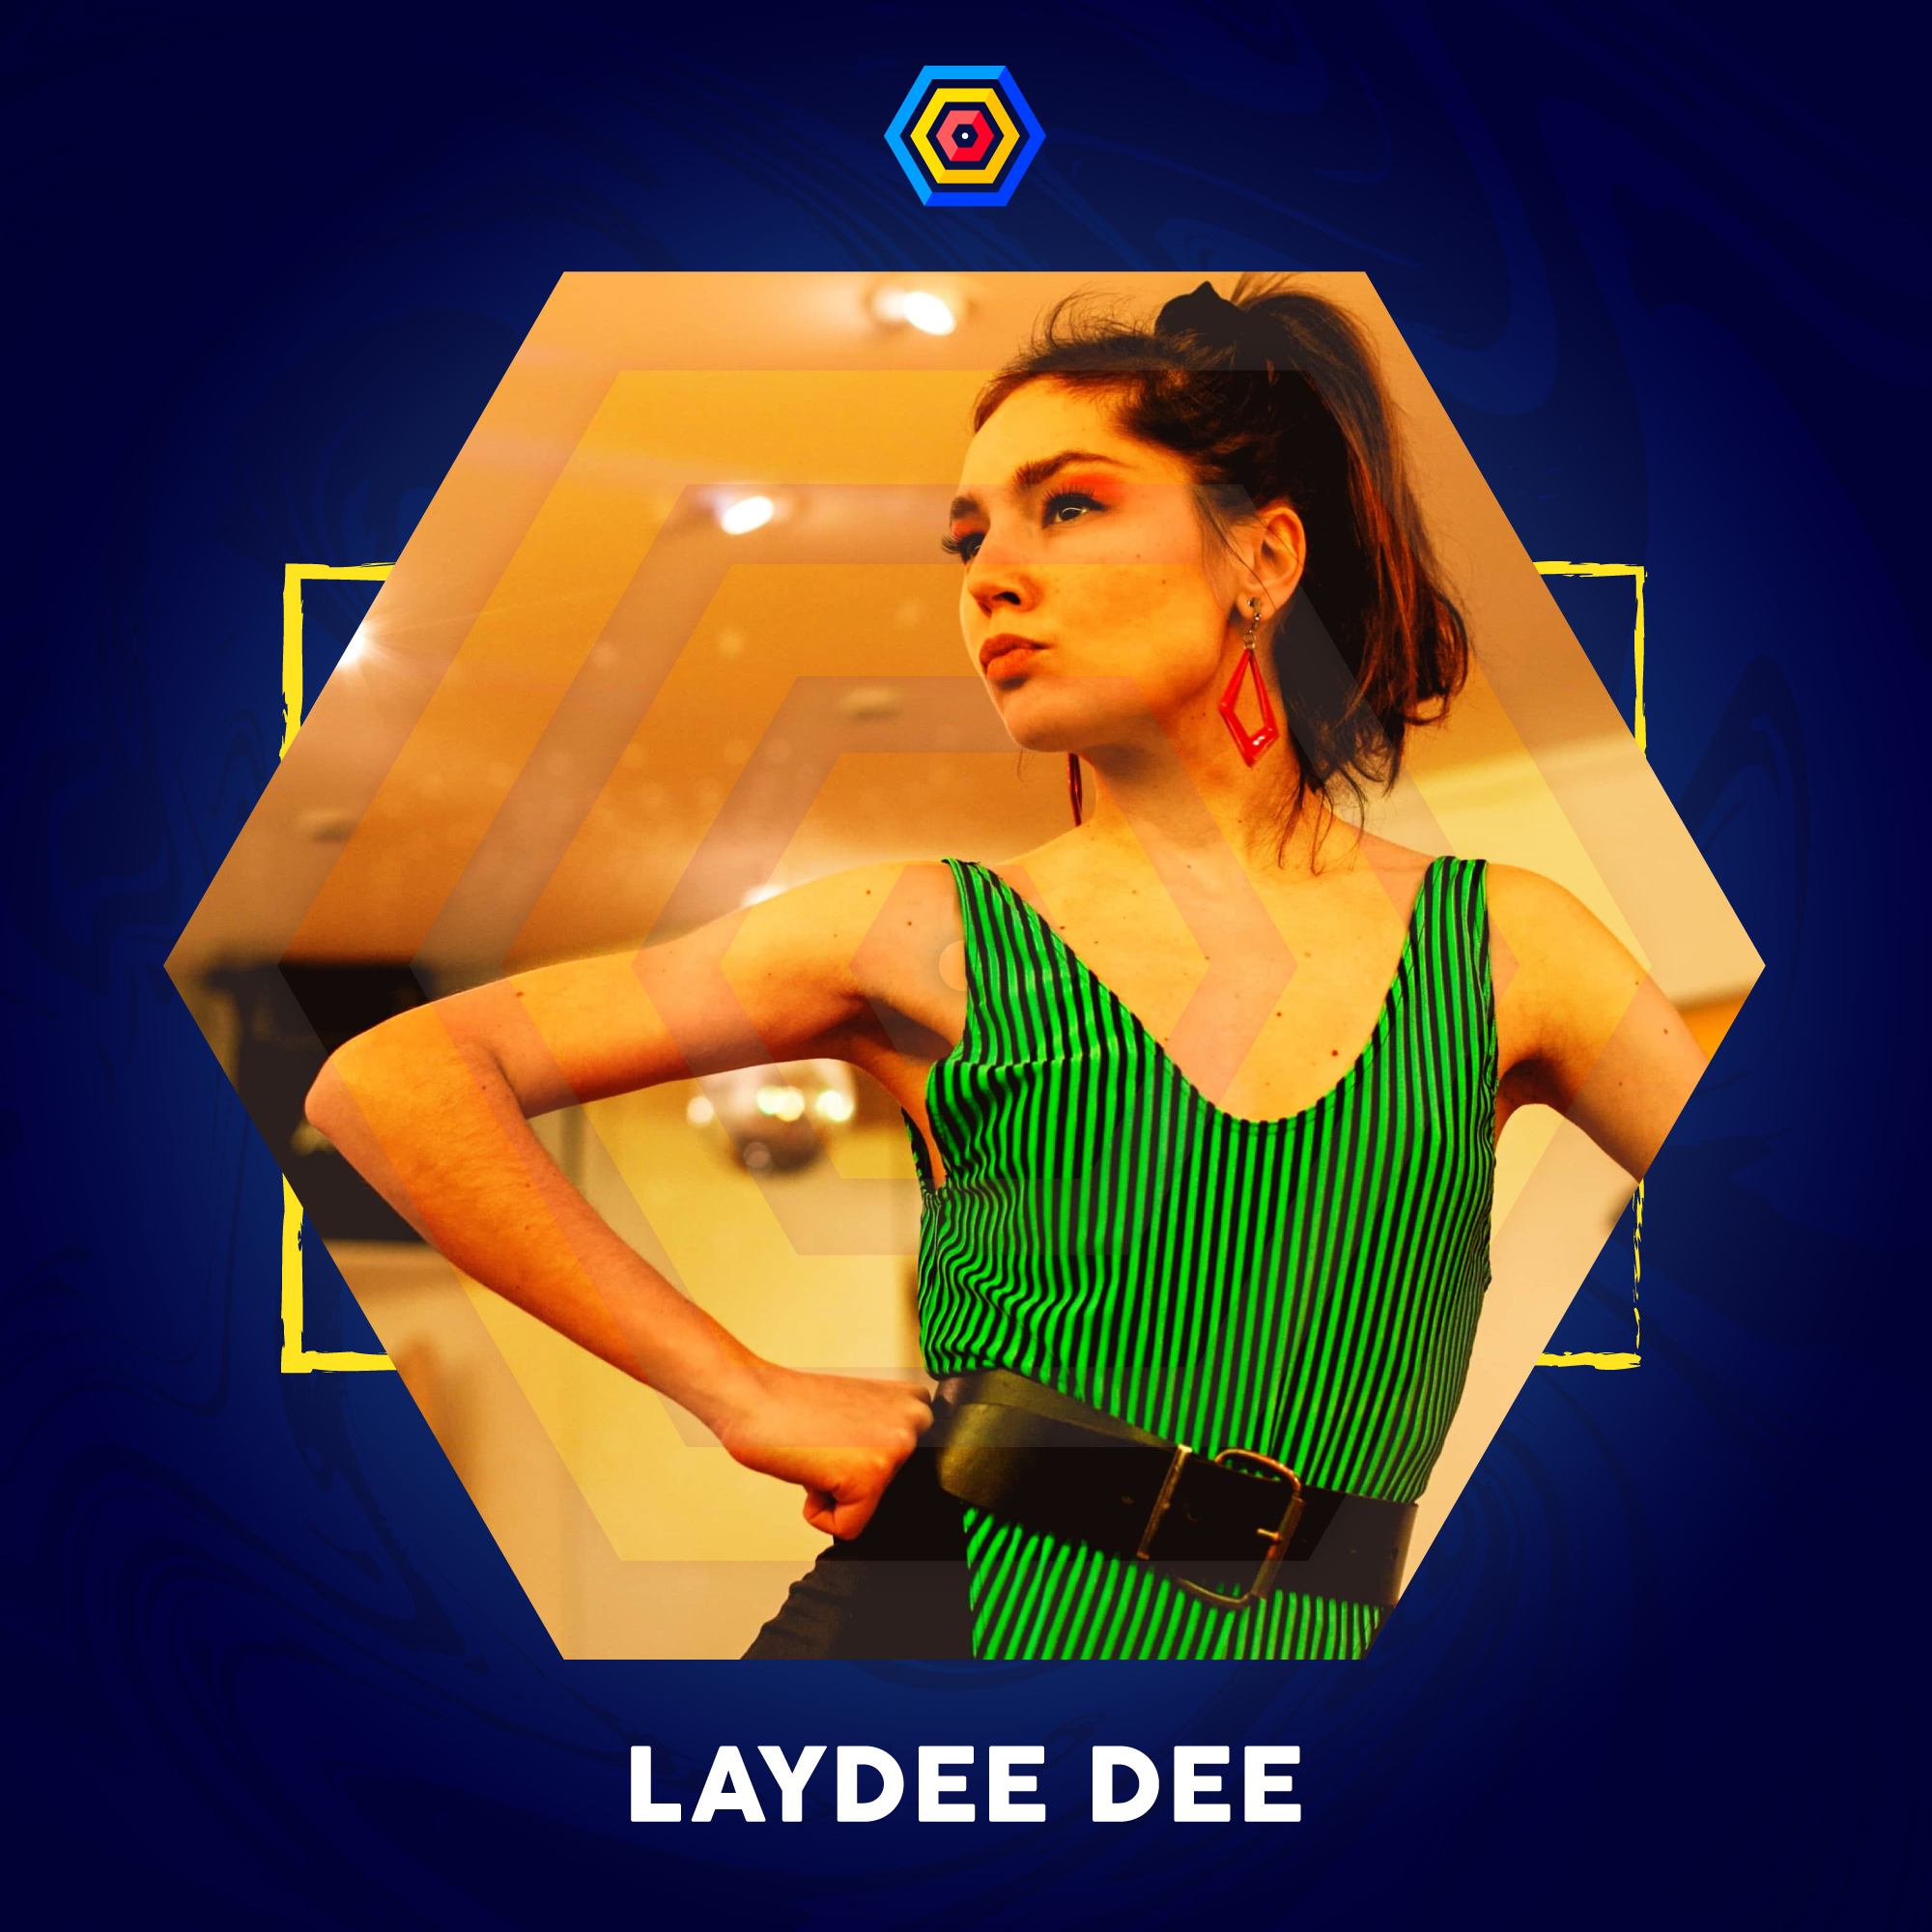 Lady-lee